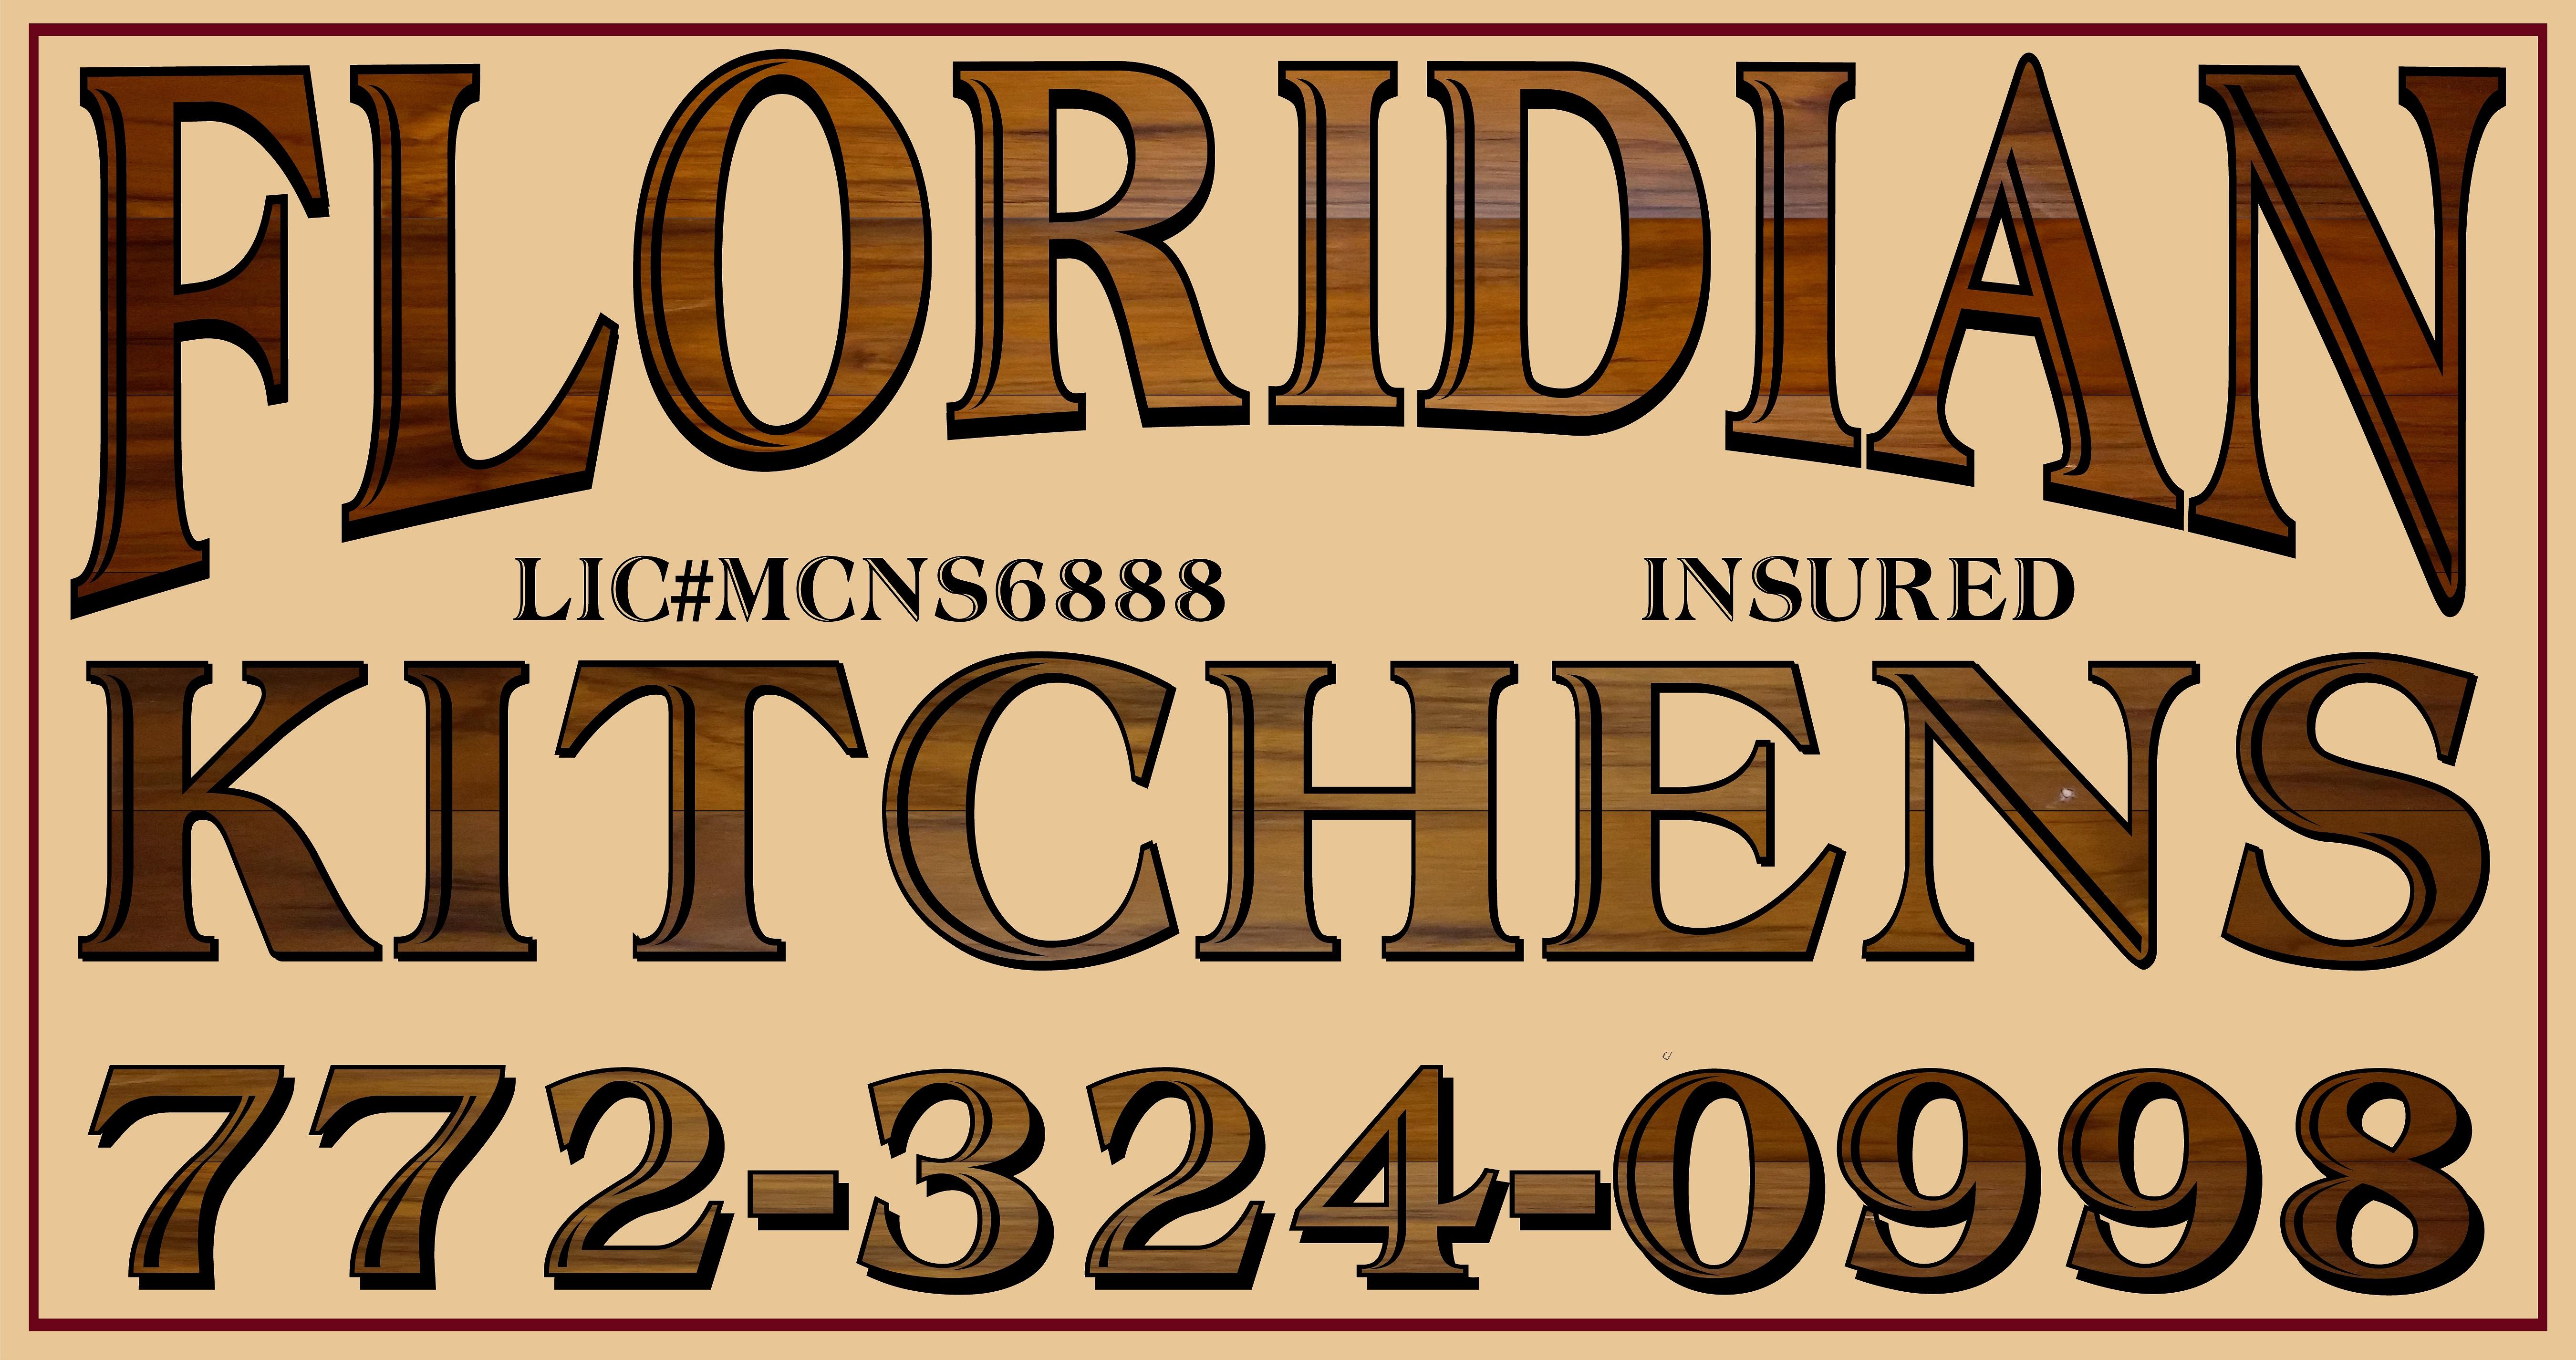 Floridian Kitchens